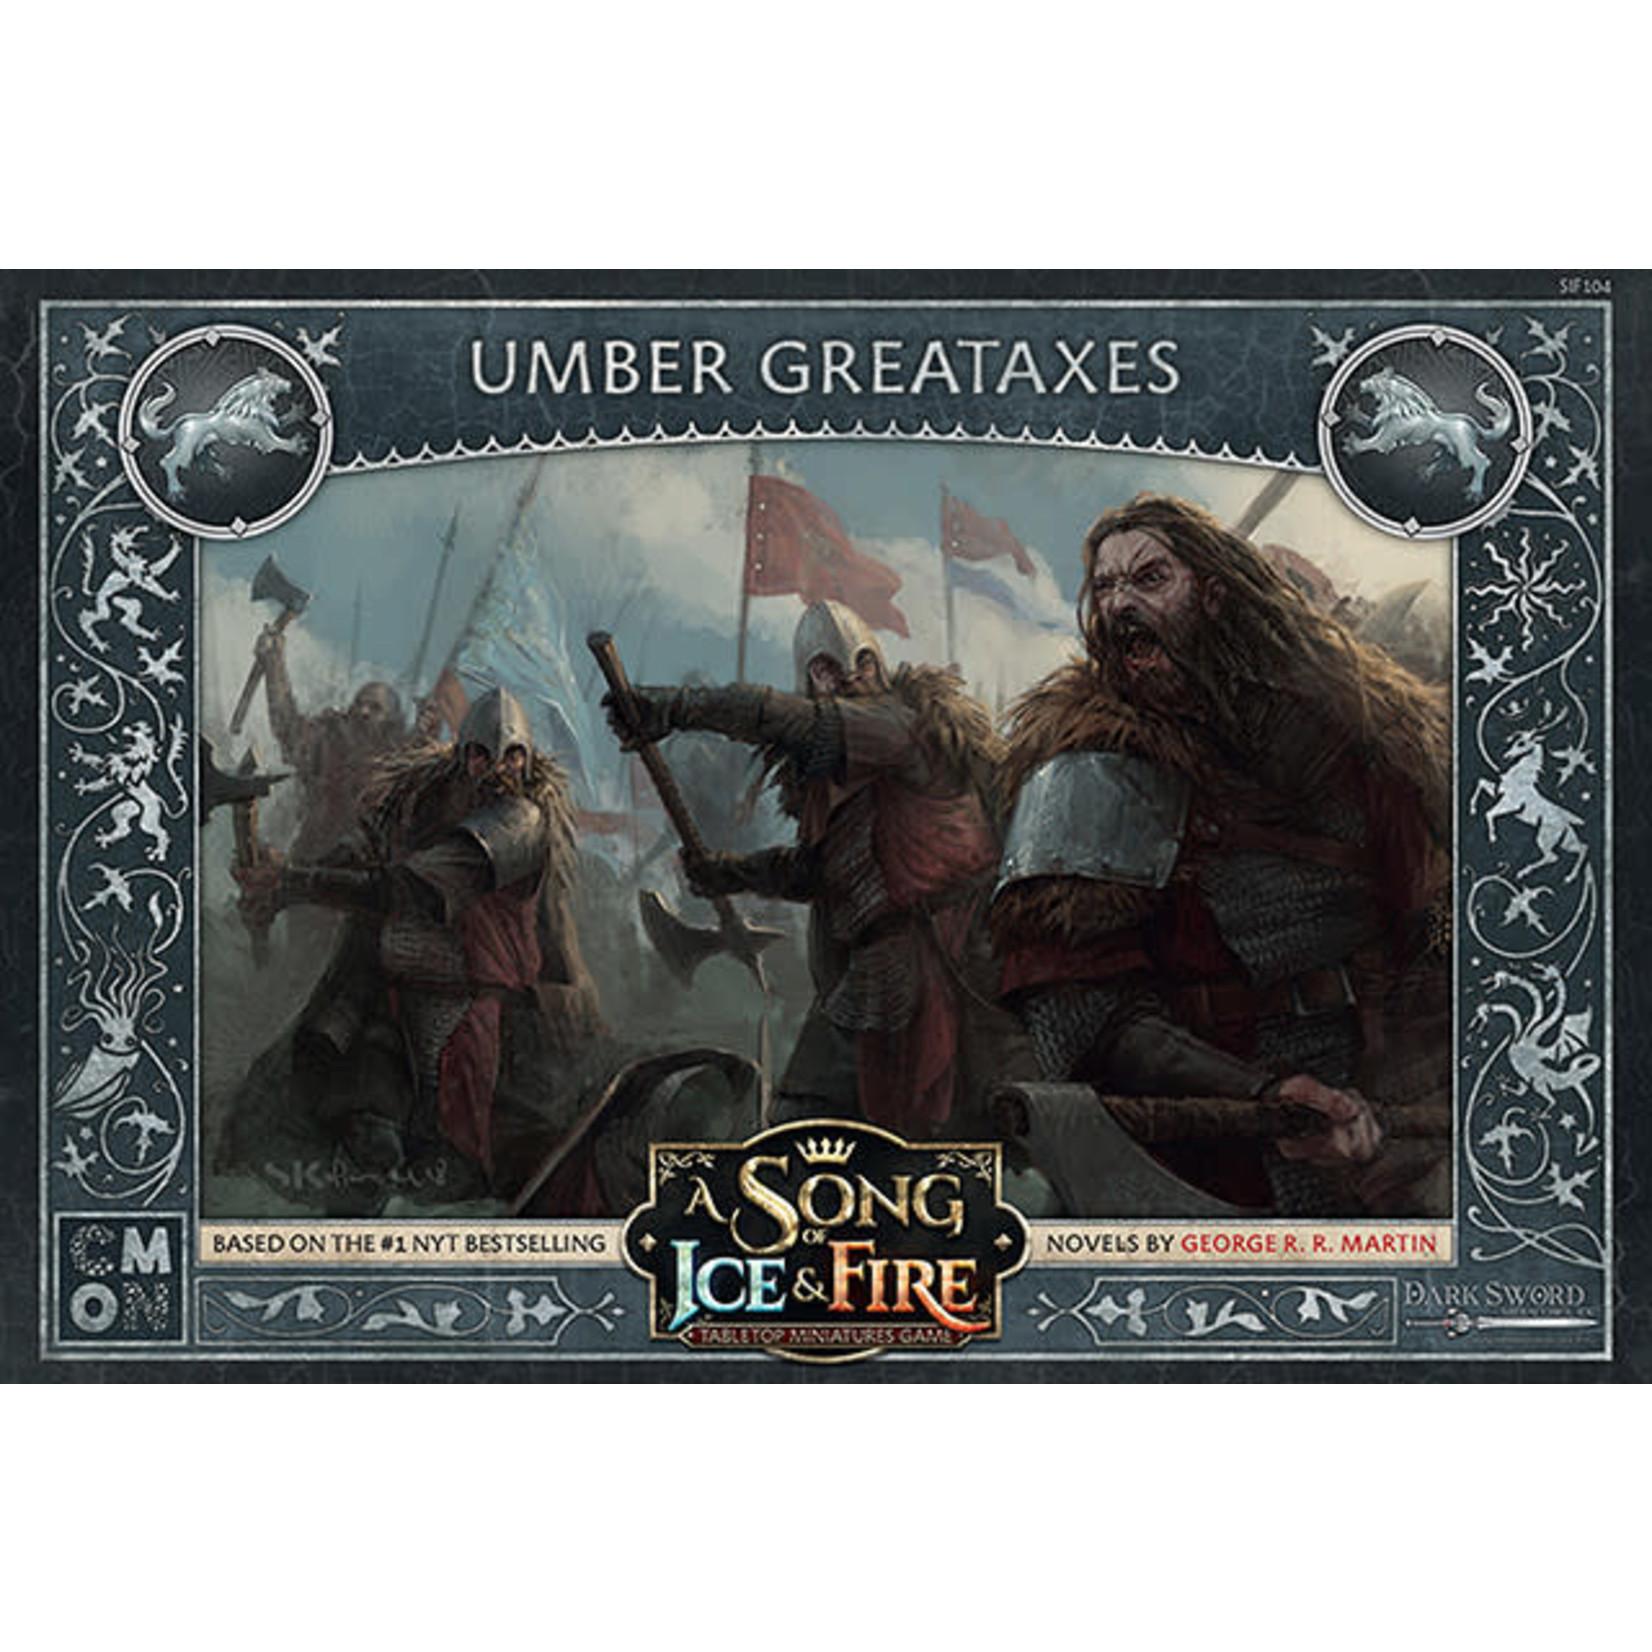 CMON A Song of Ice & Fire: Stark Umber Greataxes